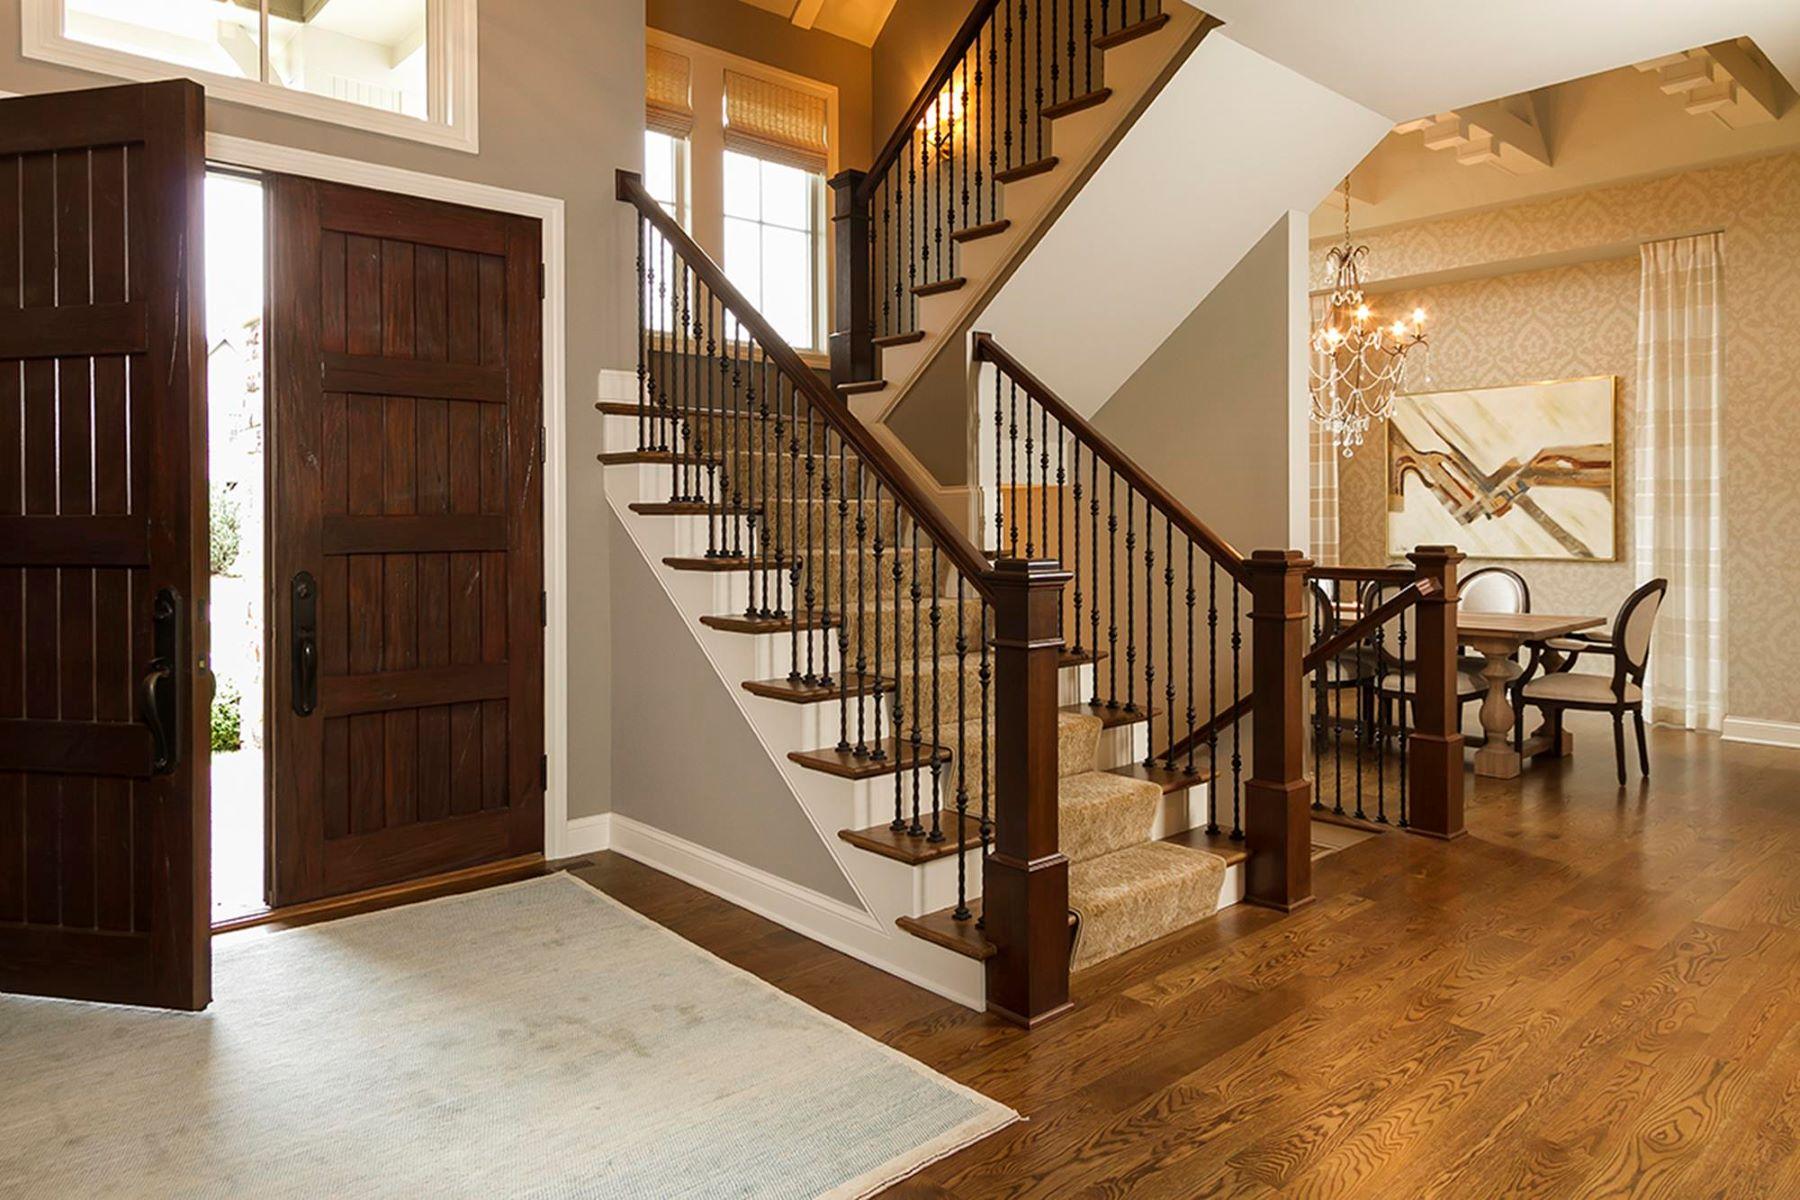 واحد منزل الأسرة للـ Sale في 9790 Sky Lane 9790 Sky Lane Eden Prairie, Minnesota, 55347 United States